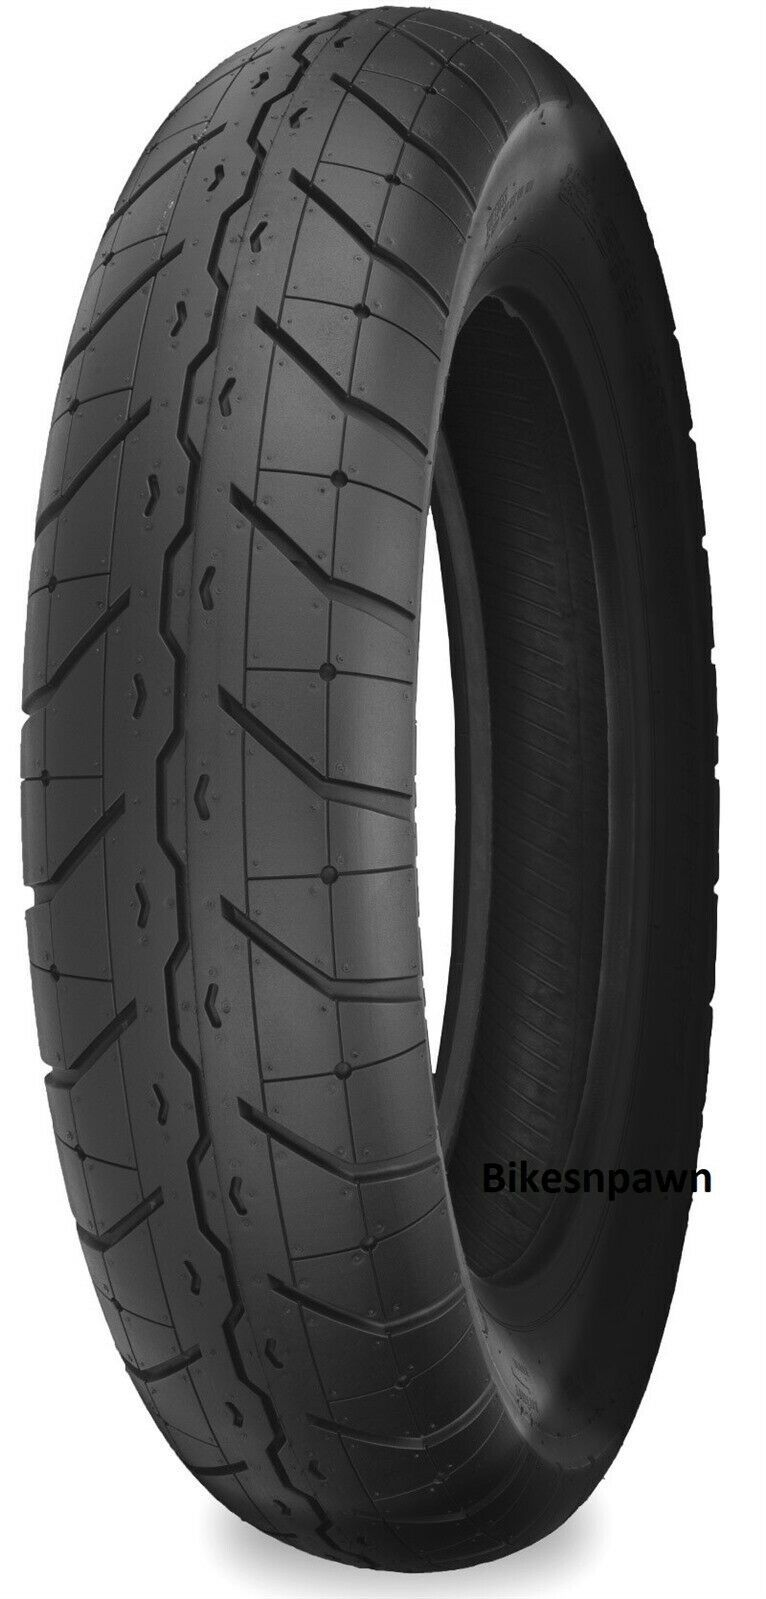 New Shinko 230 Tour Master 80/90-21 Front Motorcycle Tire 48H